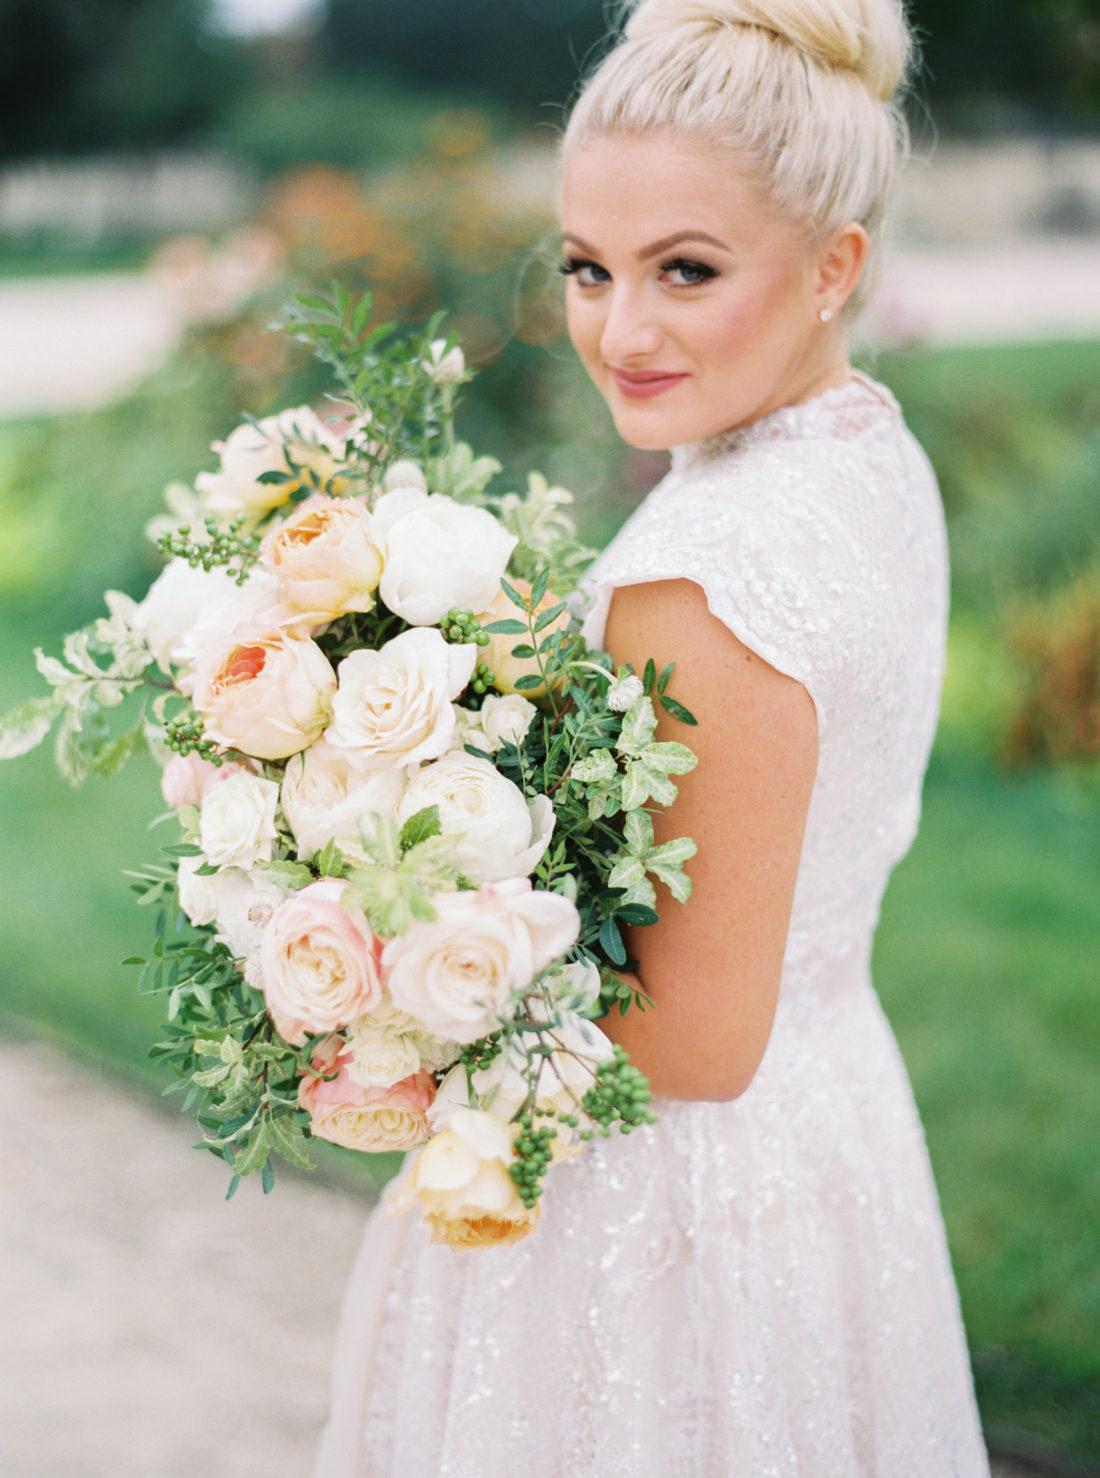 Paris Wedding Planner Tips For Planning Your Destination